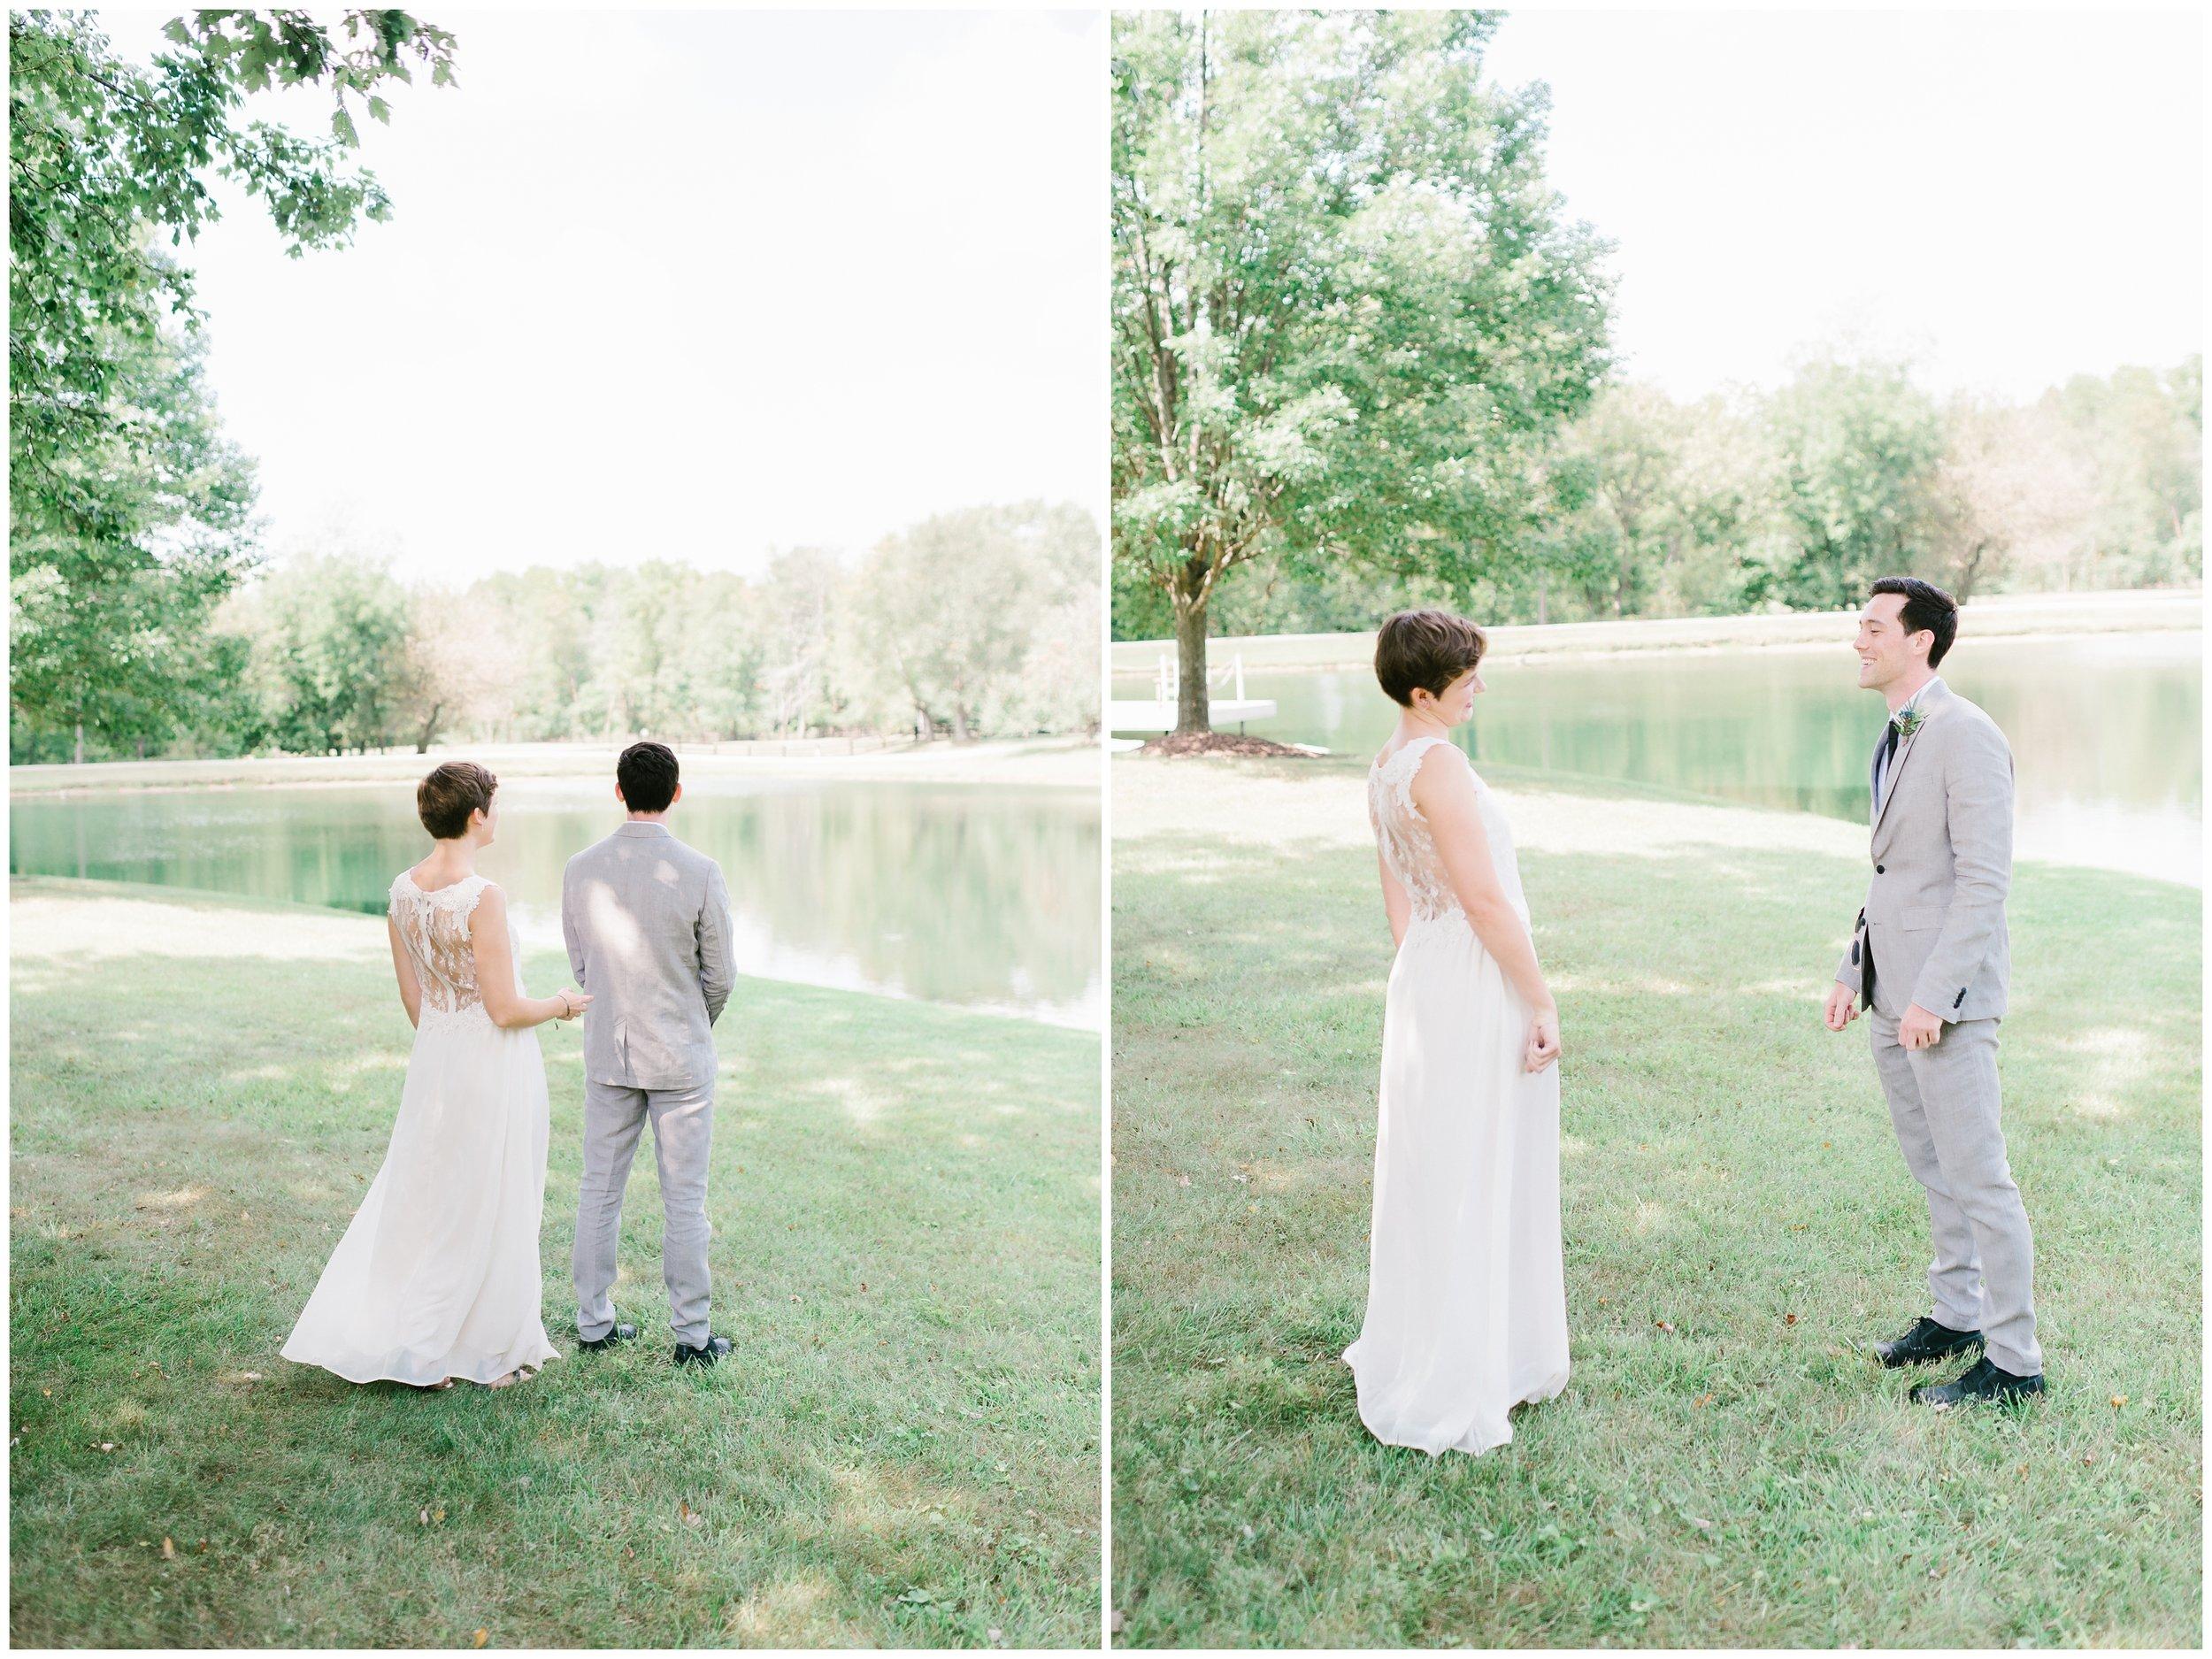 Rebecca_Shehorn_Photography_Indianapolis_Wedding_Photographer_7217.jpg